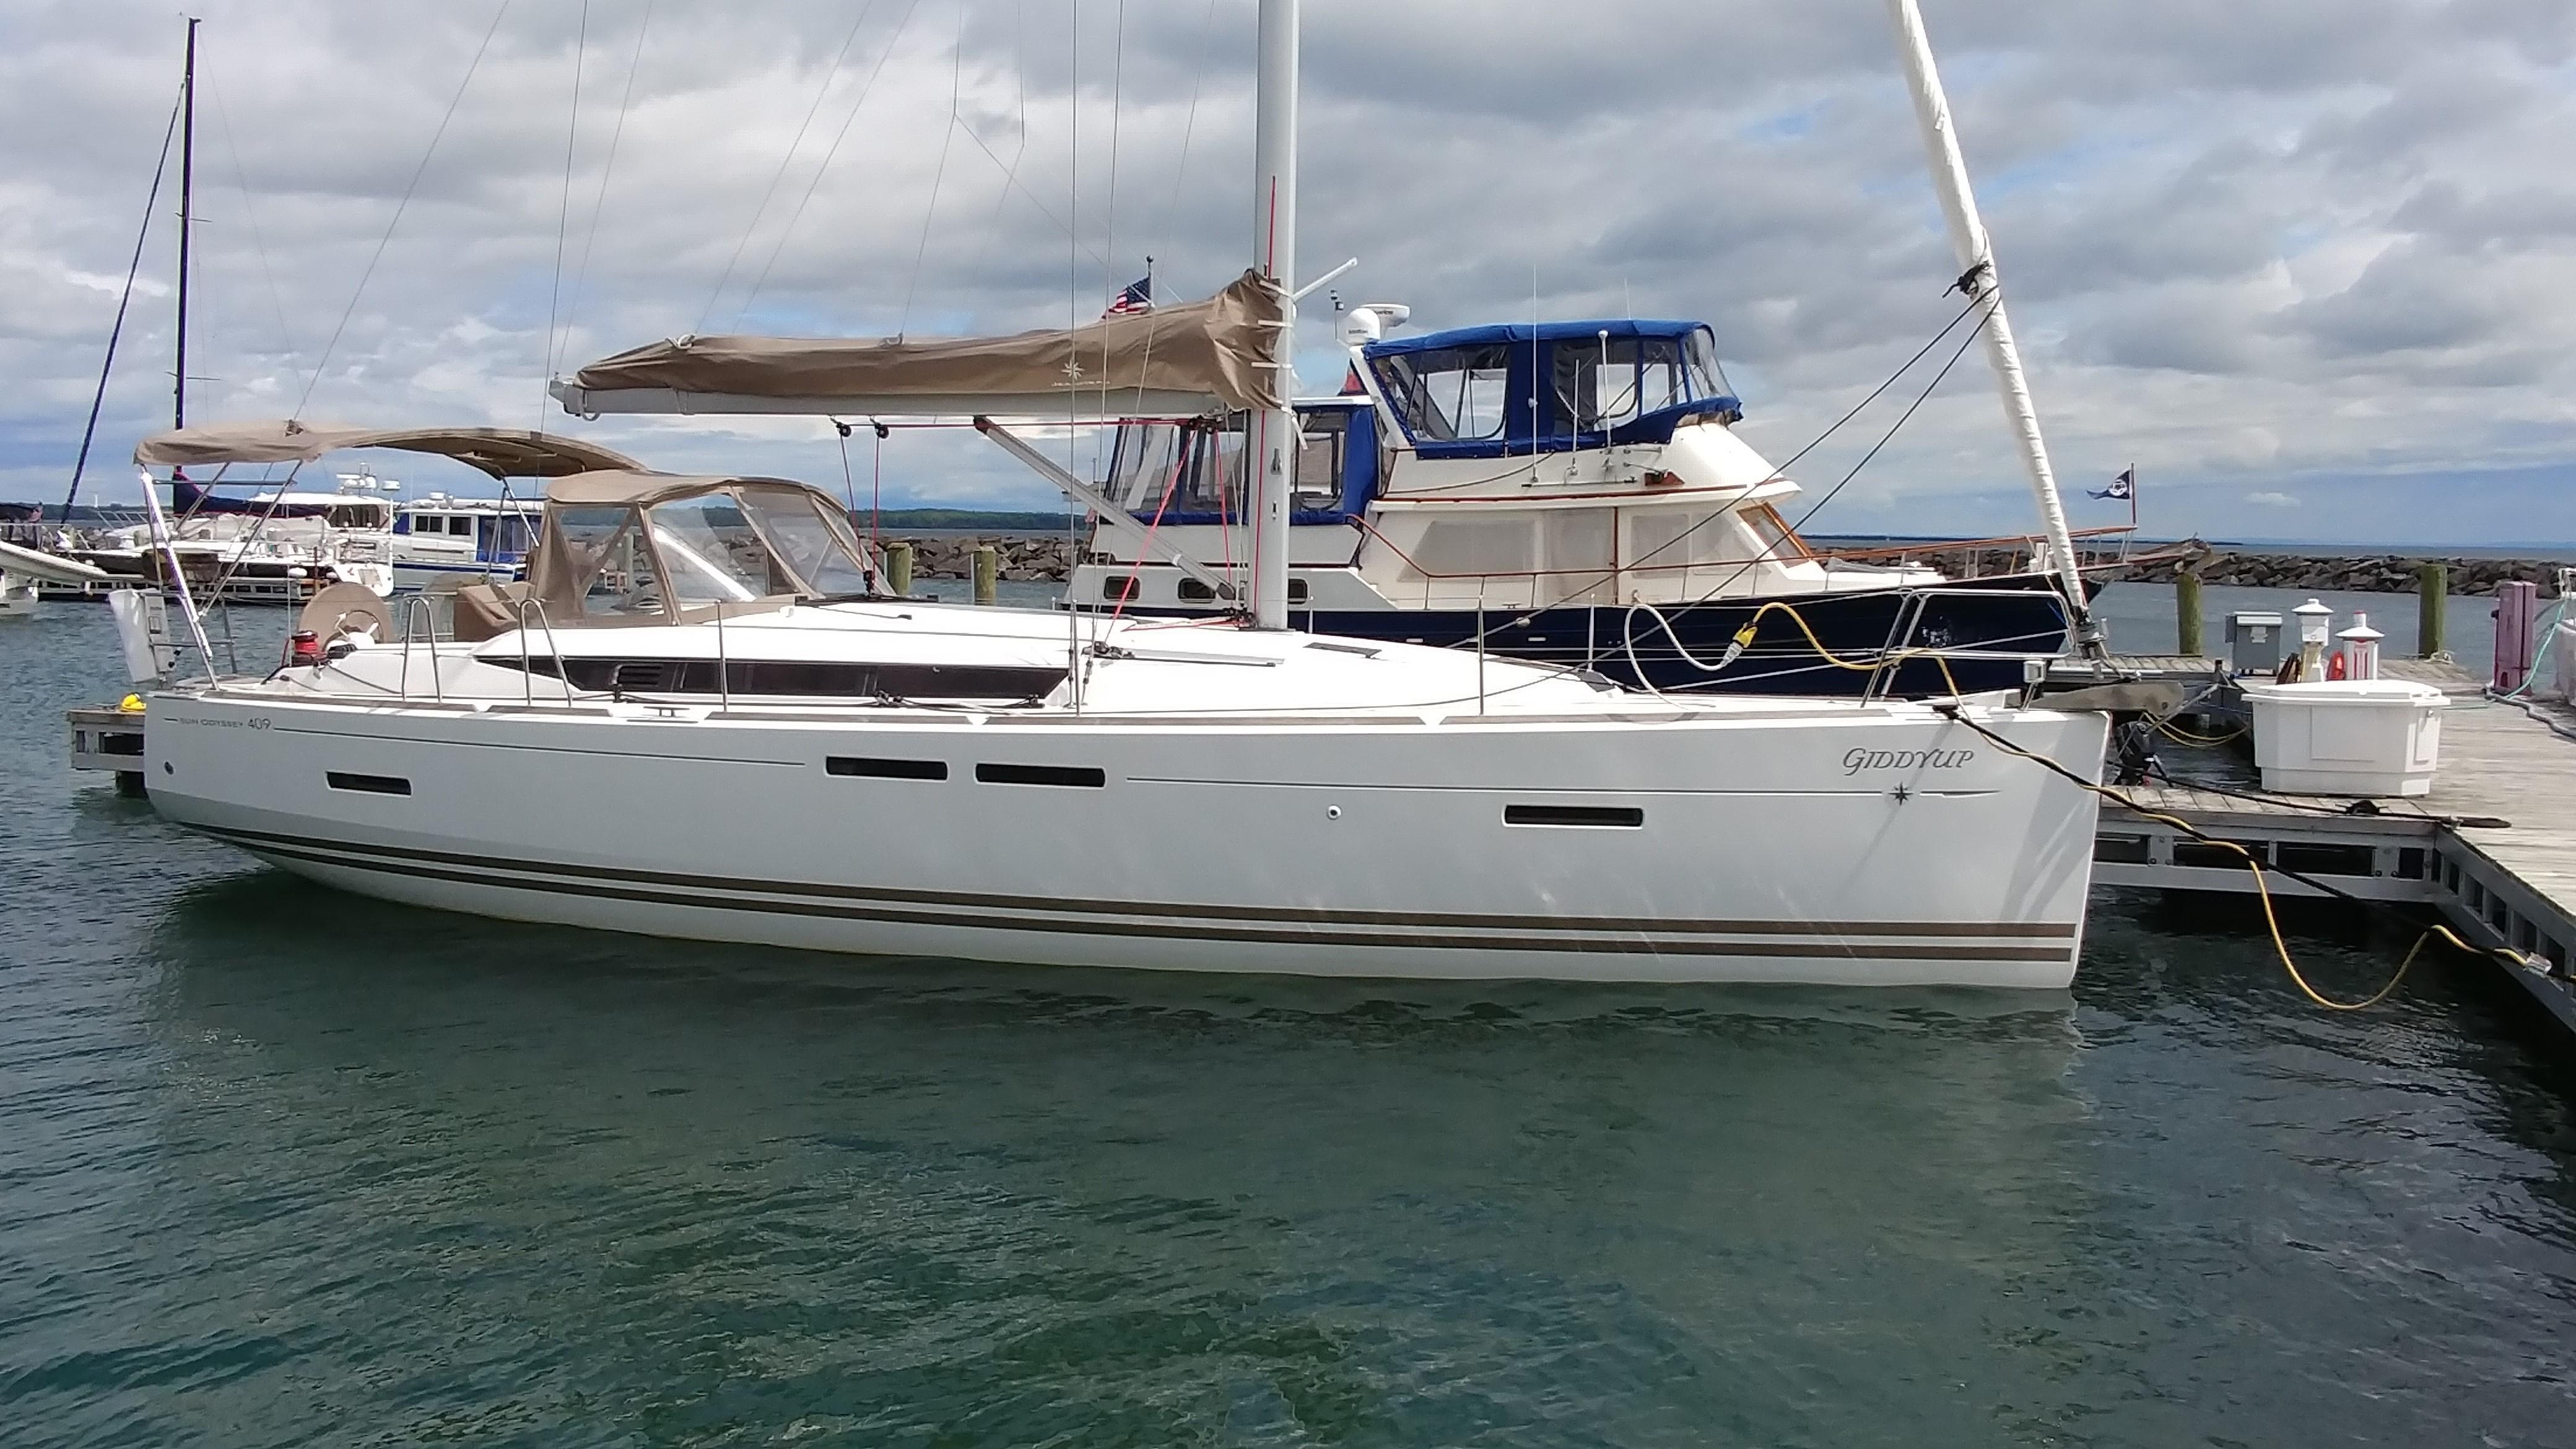 40 Jeanneau Sun Odyssey Giddyup 2011 Bayfield / Lake Superior | Denison  Yacht Sales